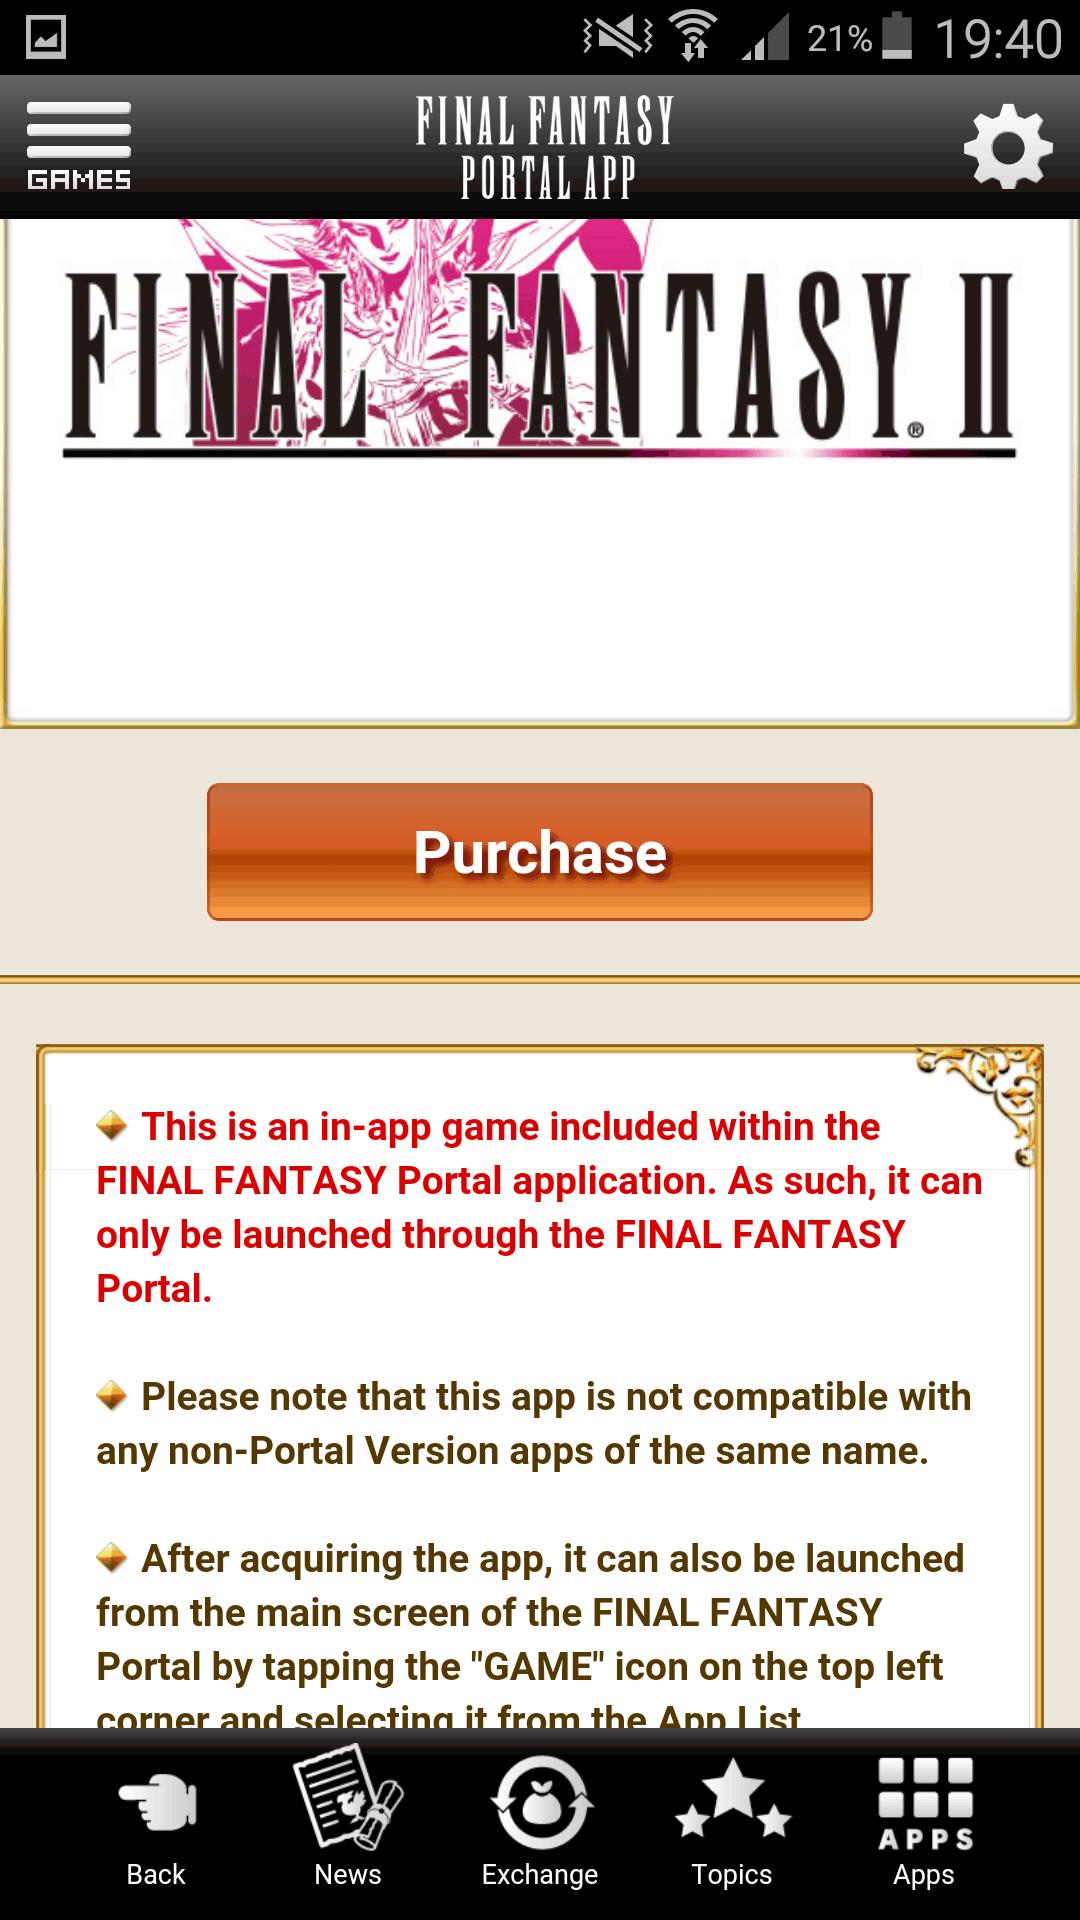 Final Fantasy Portal App Screenshot 2 AH